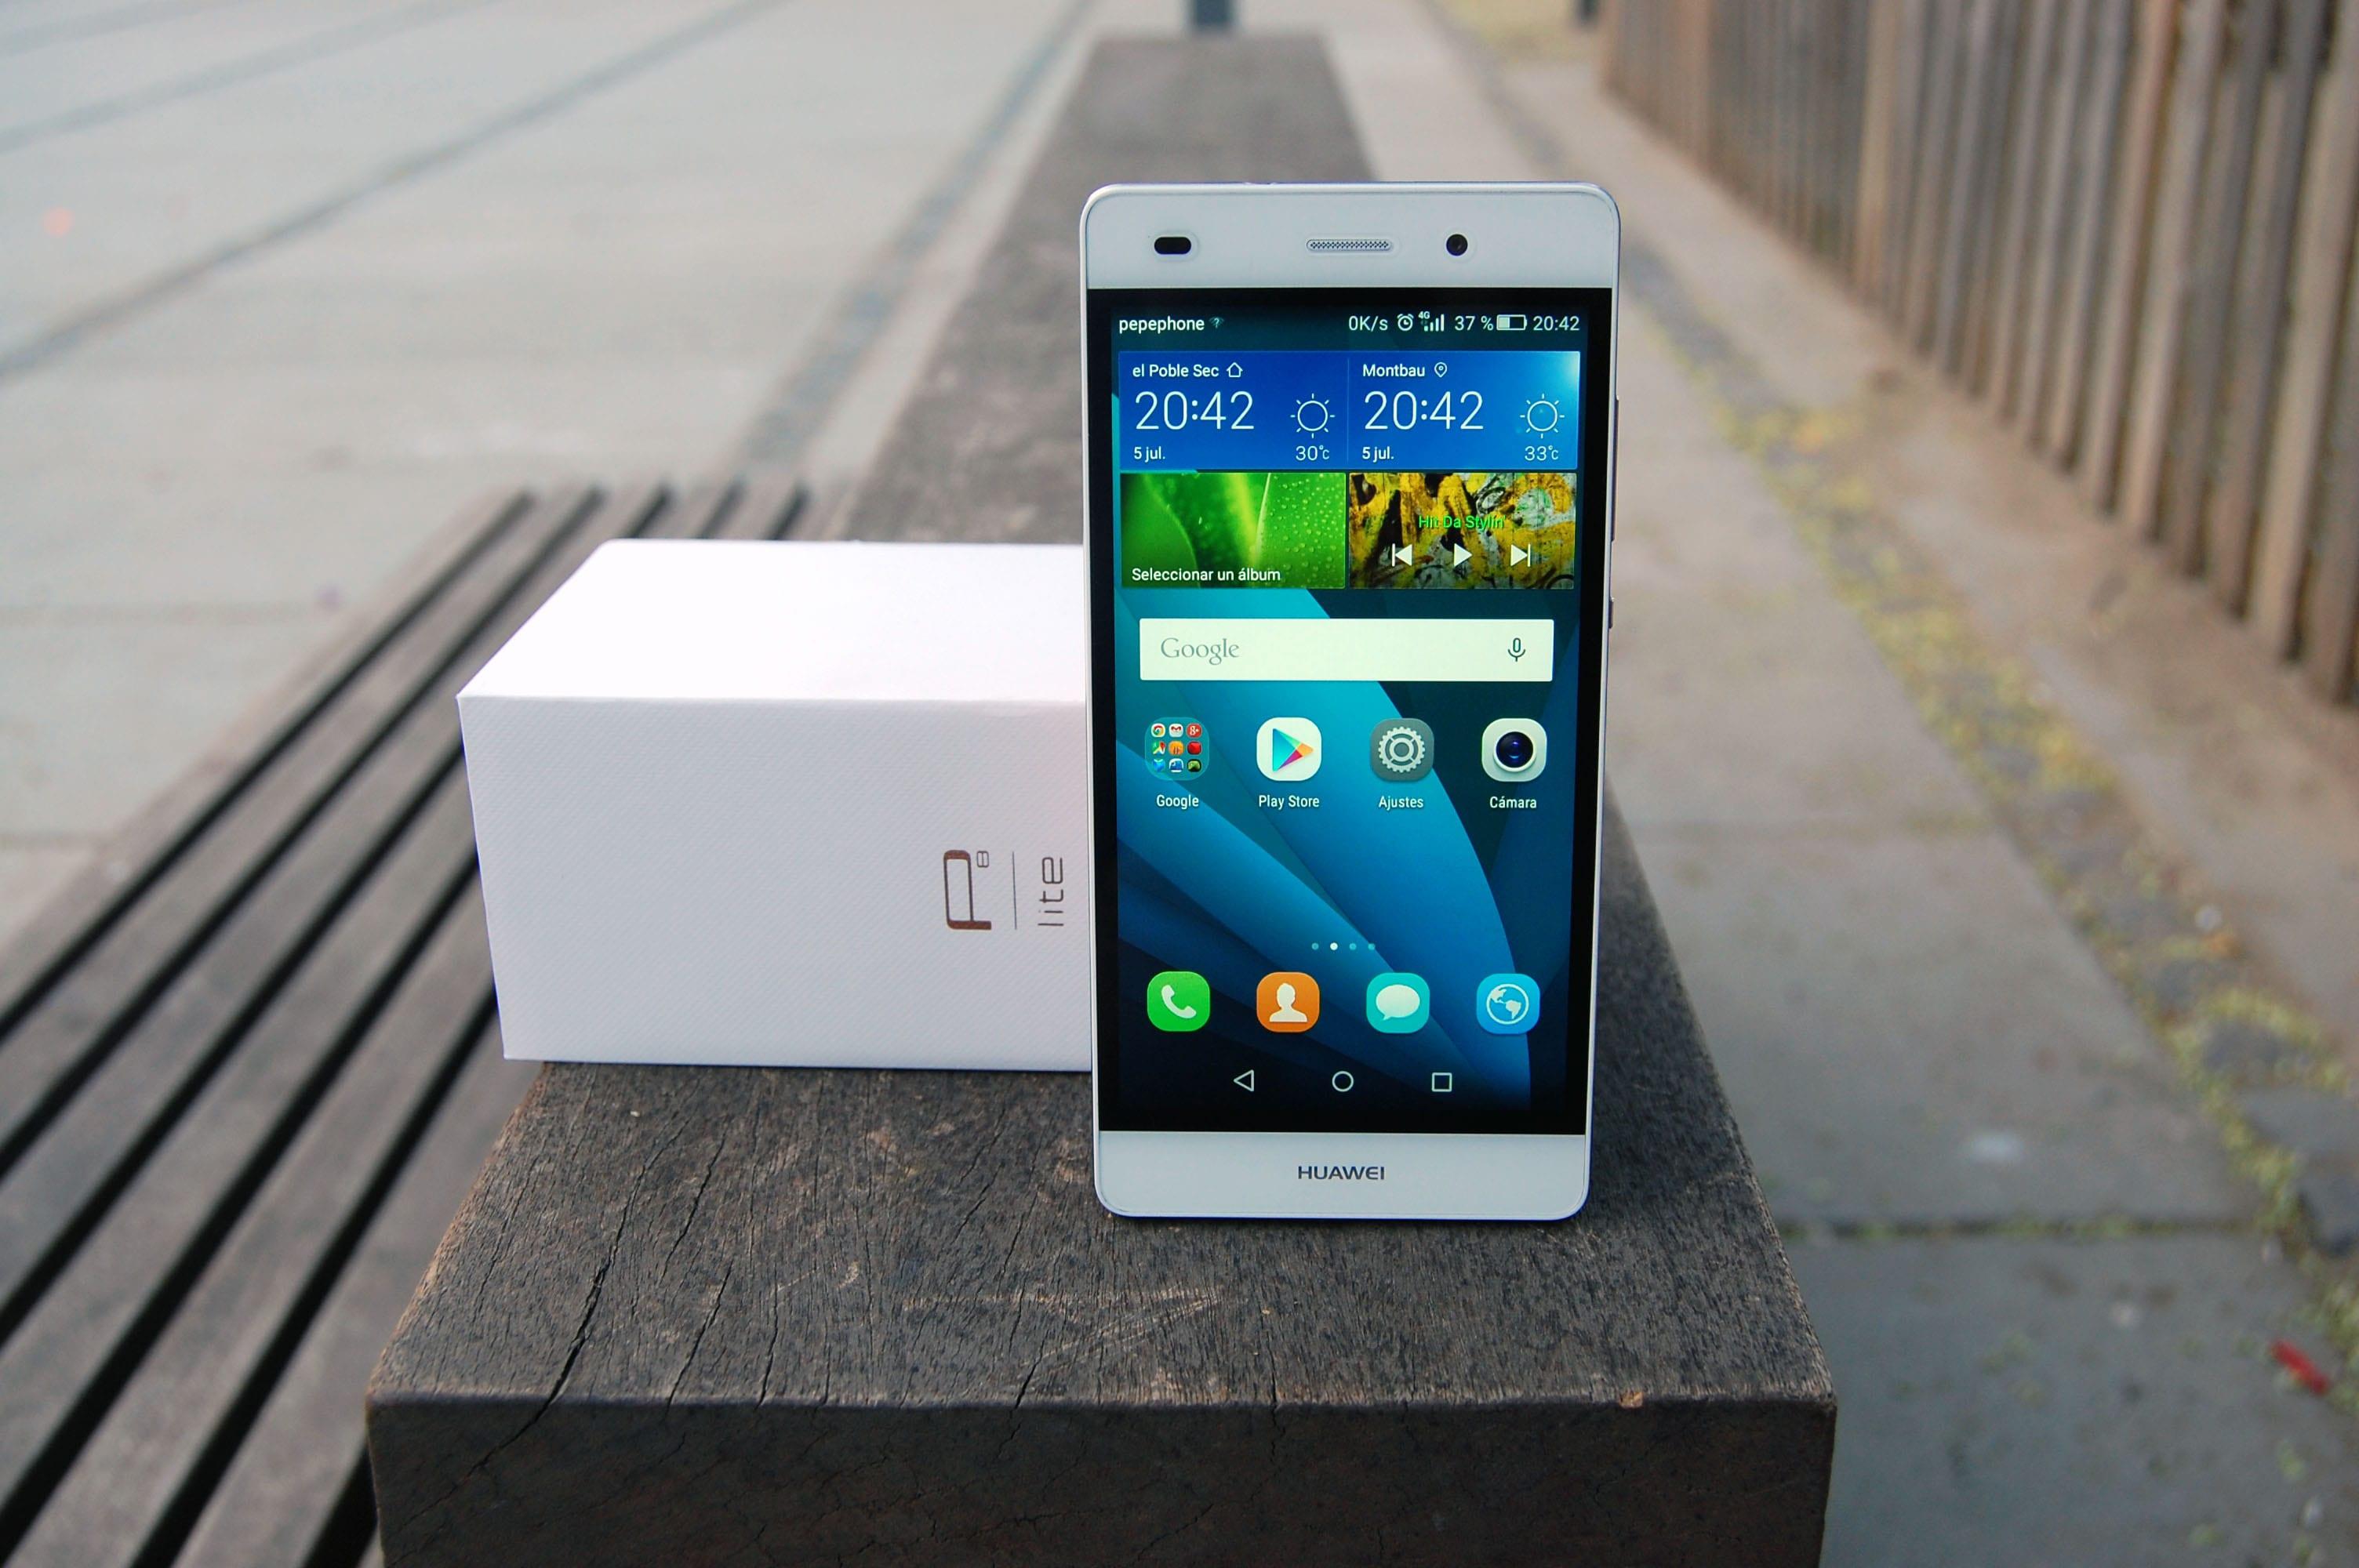 b136da6d9f6 Cómo desbloquear el Bootloader del Huawei P8 Lite paso a paso